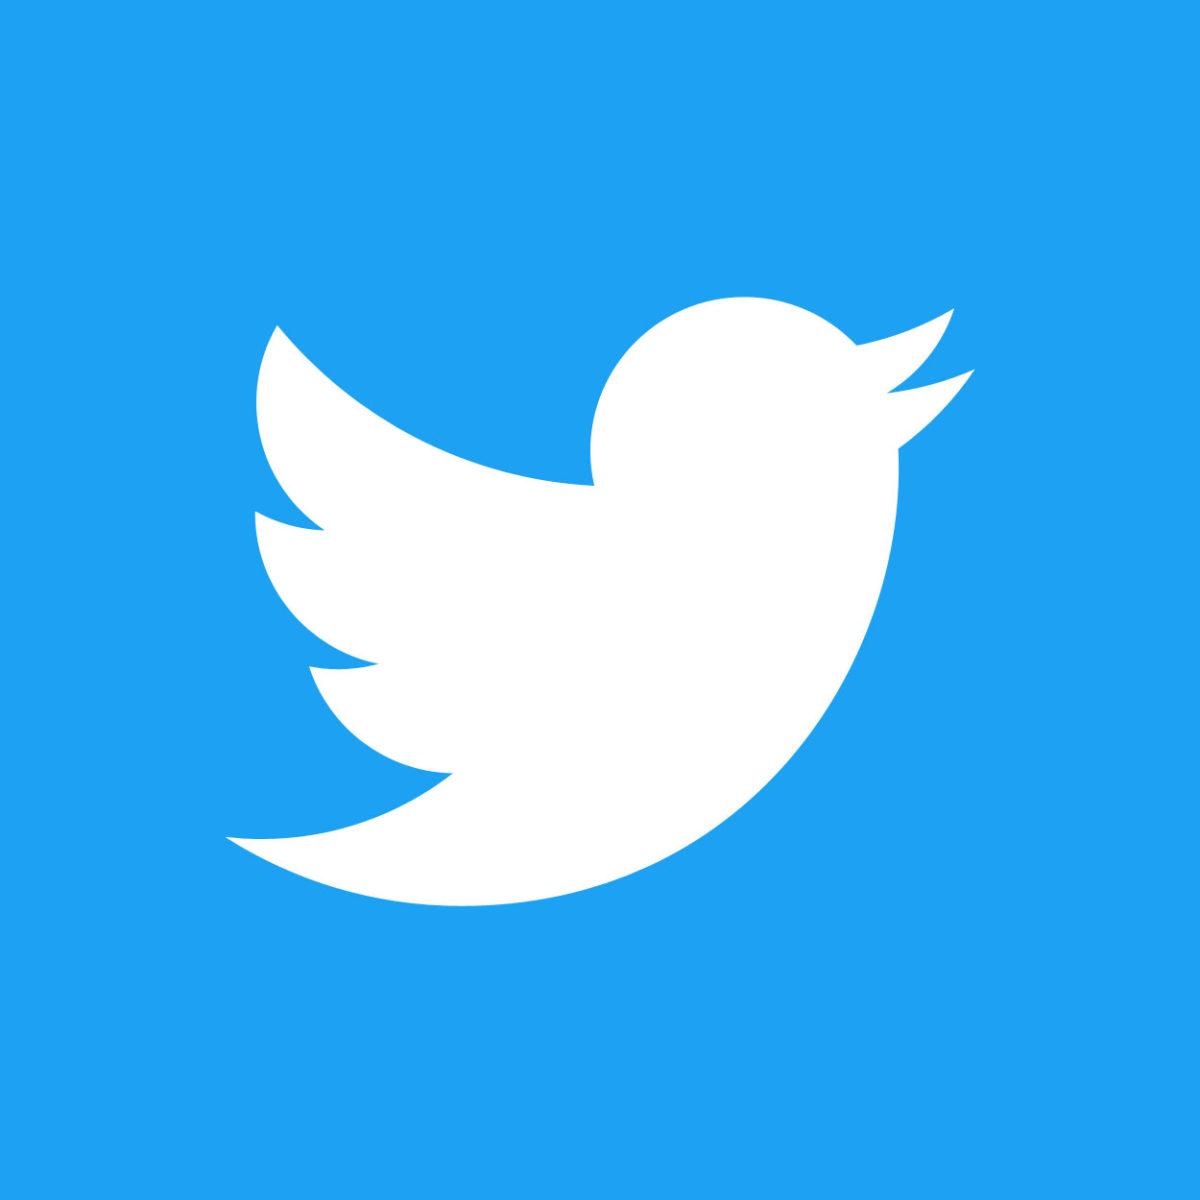 twitter-logo-1200x1200